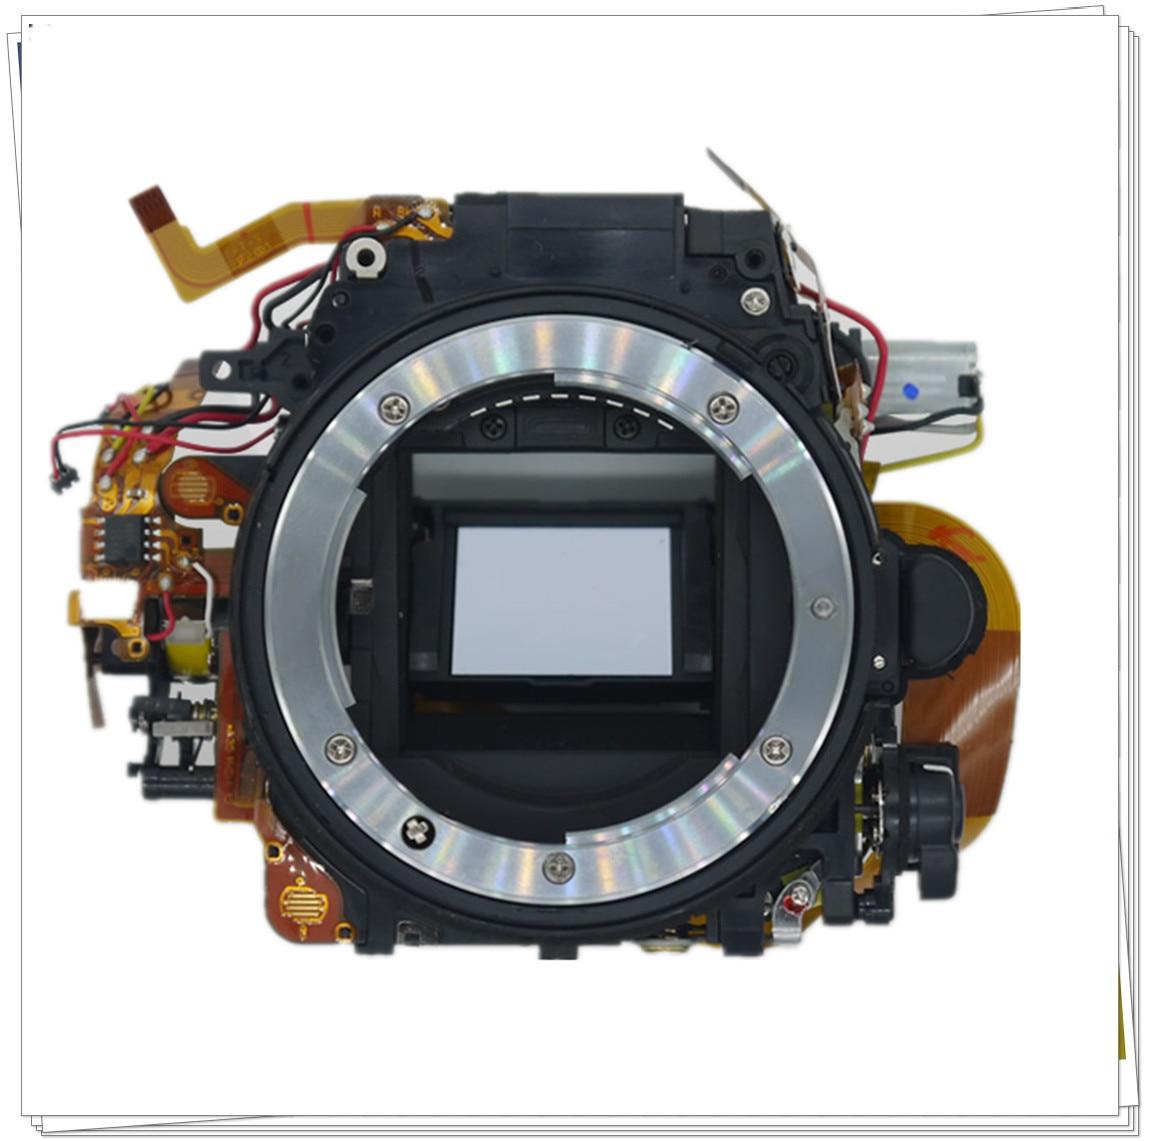 Original Small Main Body ,Mirror Box Replacement Part For Nikon D7200 Camera Repair parts original small main body mirror box replacement part for nikon d7200 camera repair parts